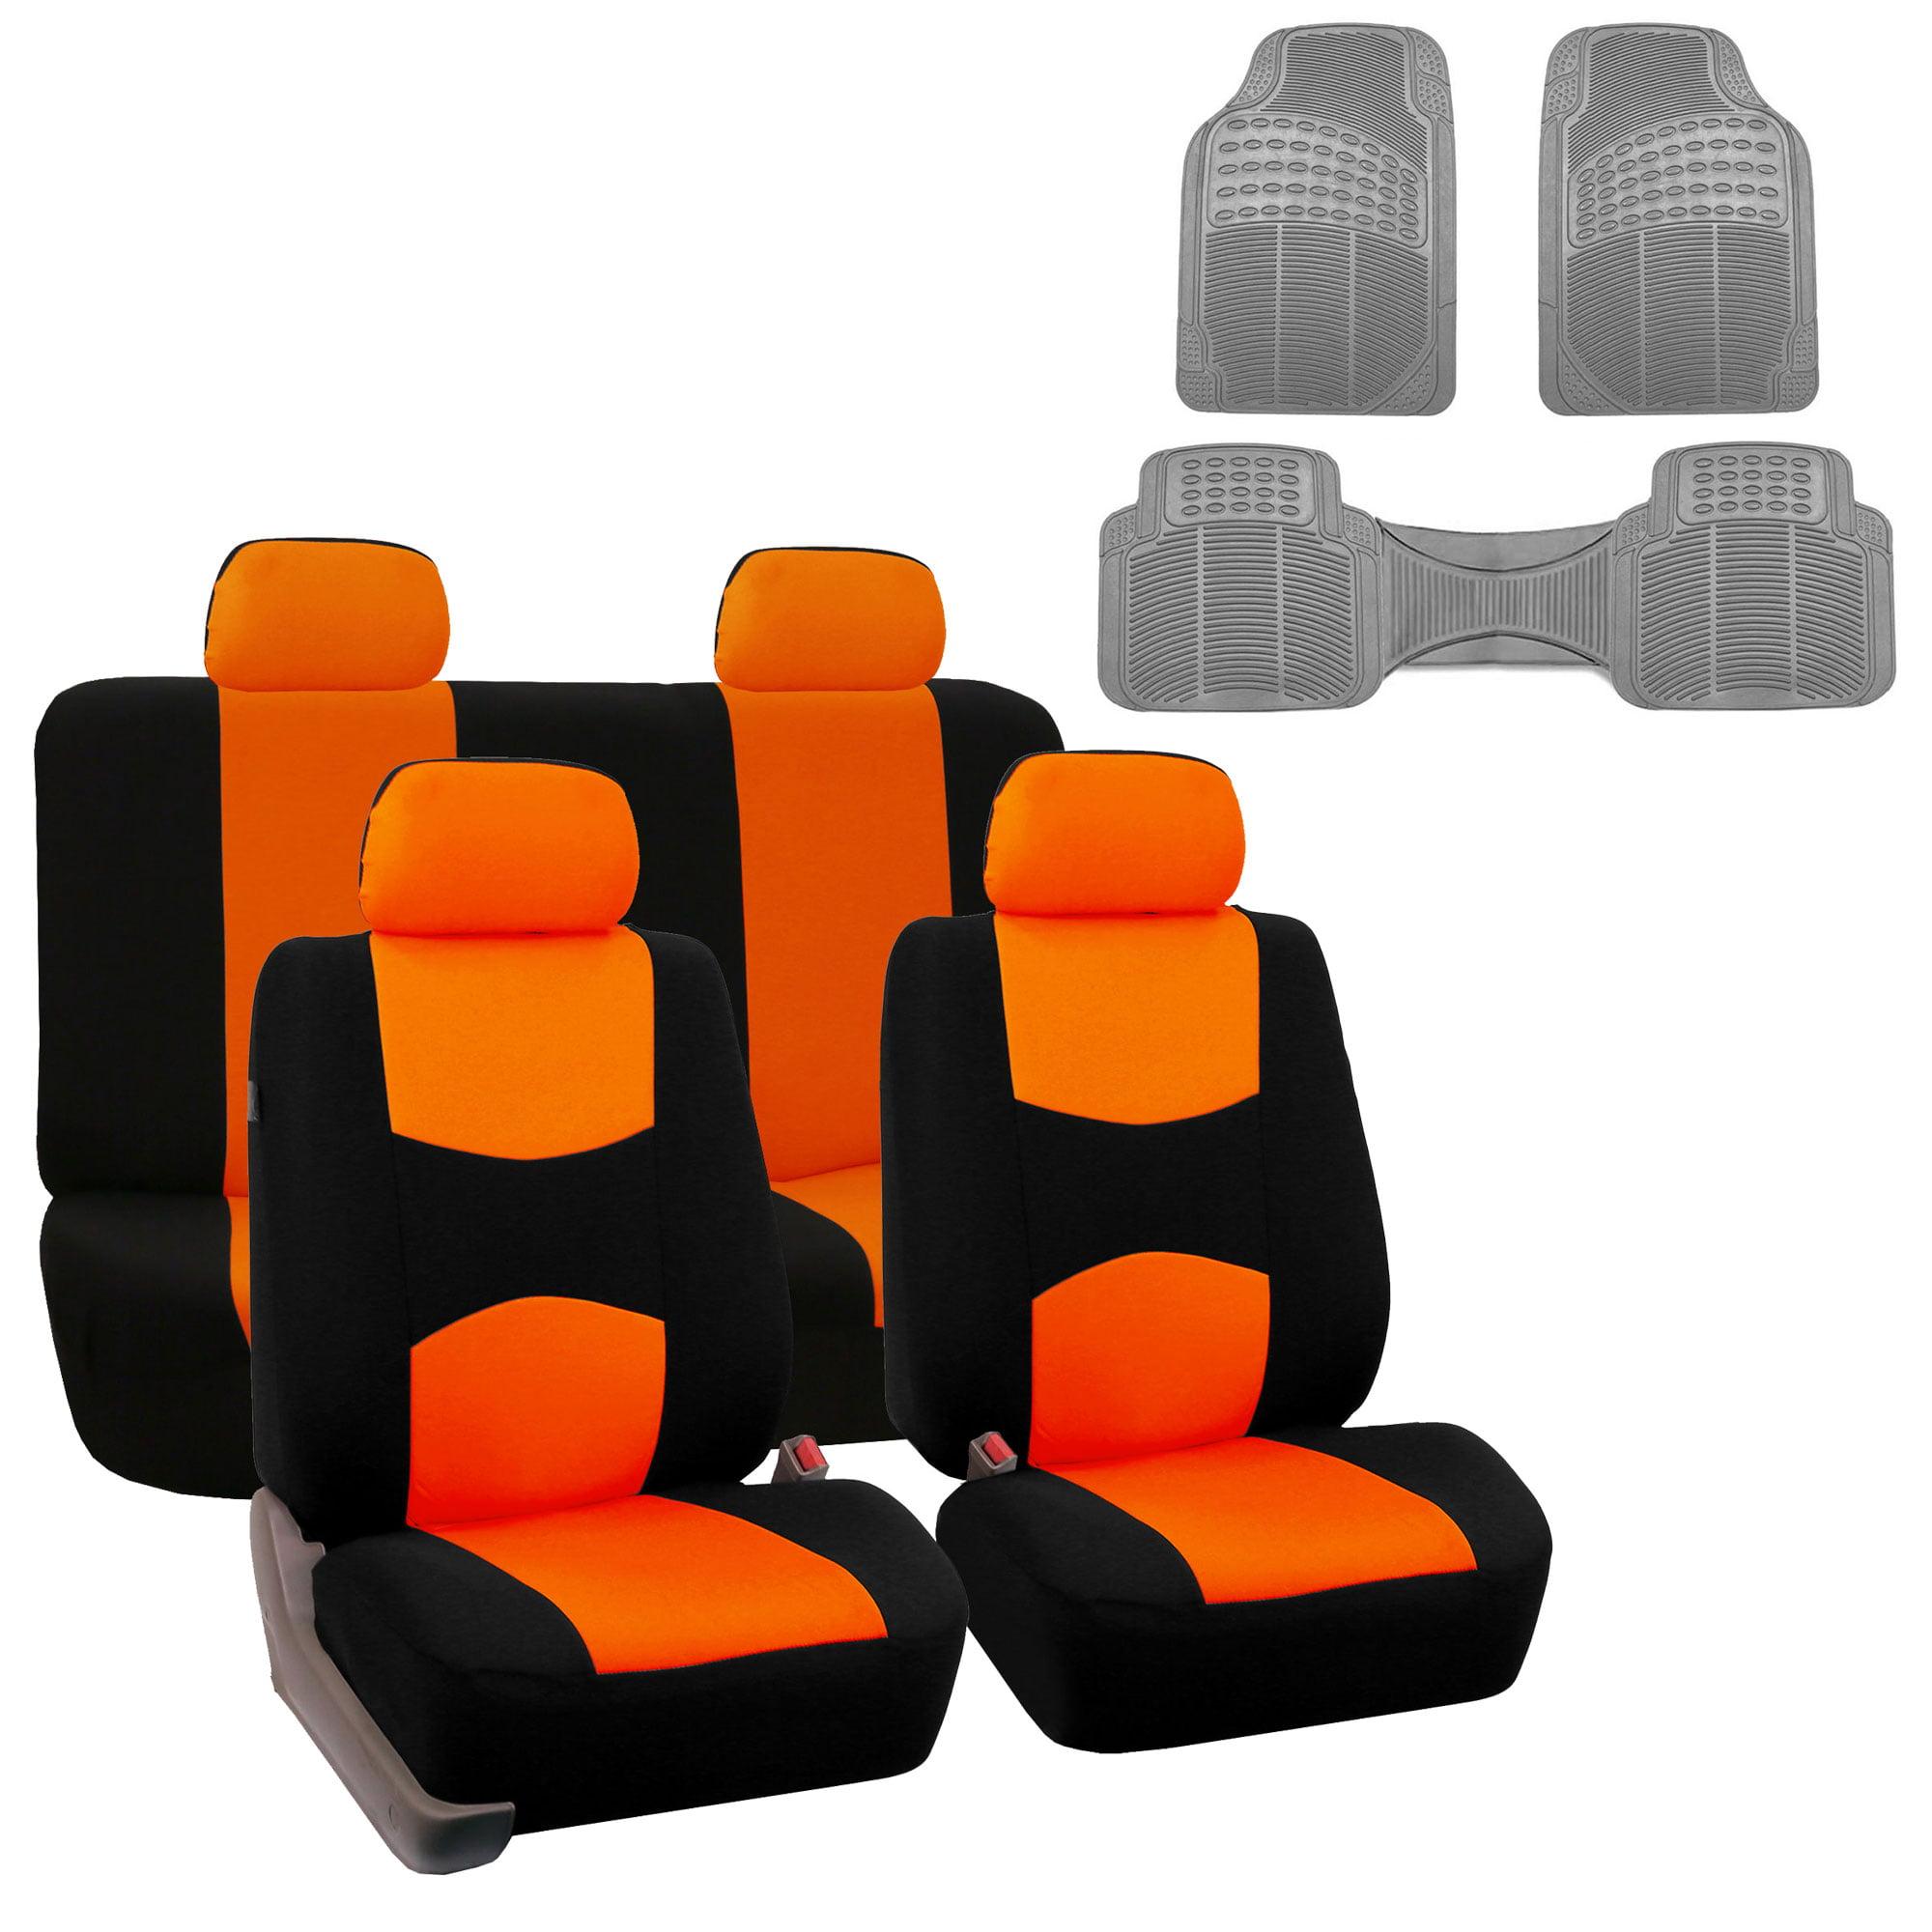 Car Seat Cover Full Set For For Auto Car SUV Truck Van w/ Floor Mat Orange